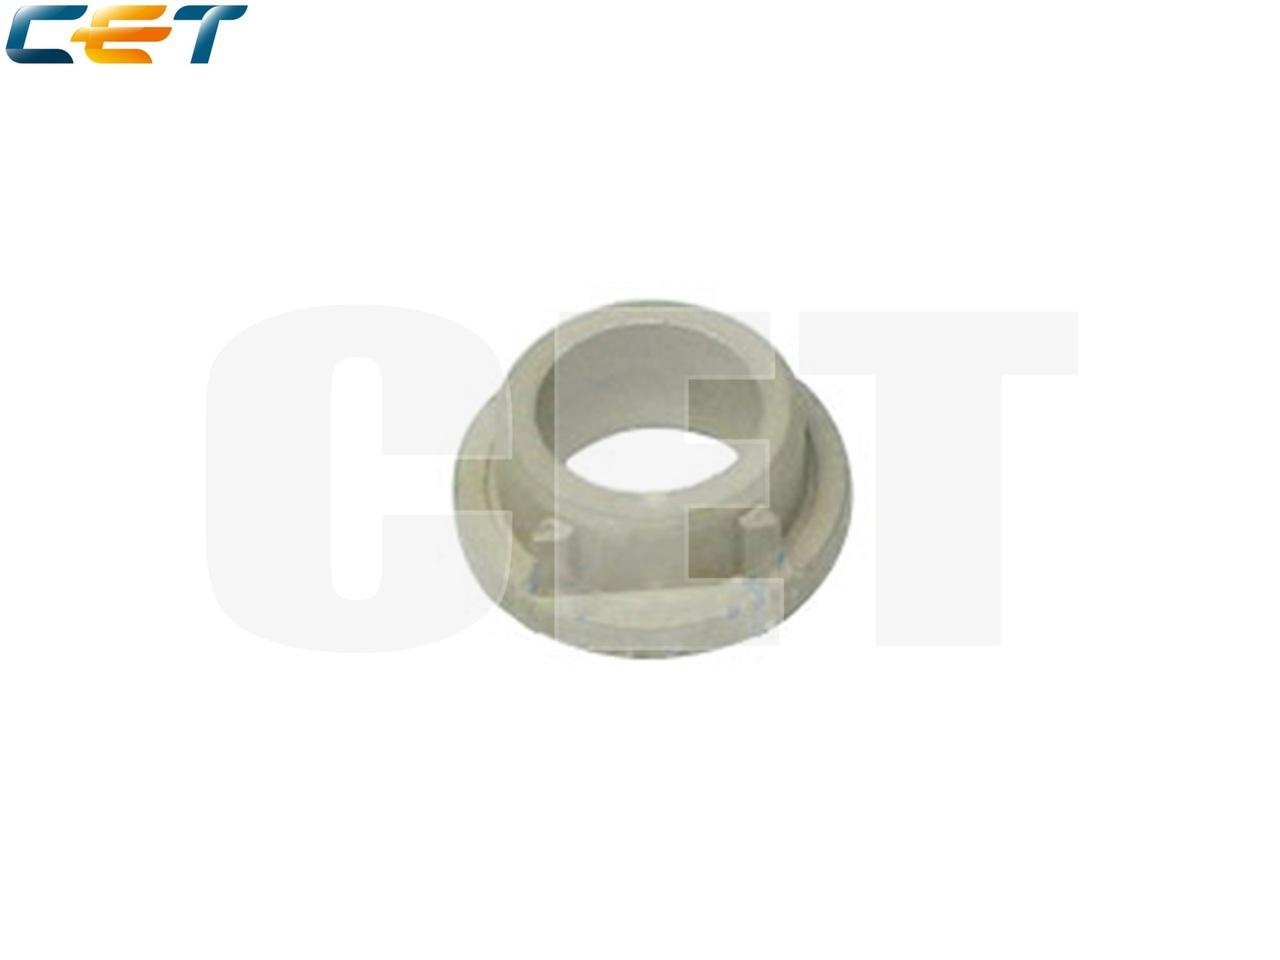 Бушинг резинового вала для HP LaserJet 5000 (CET), CET0179